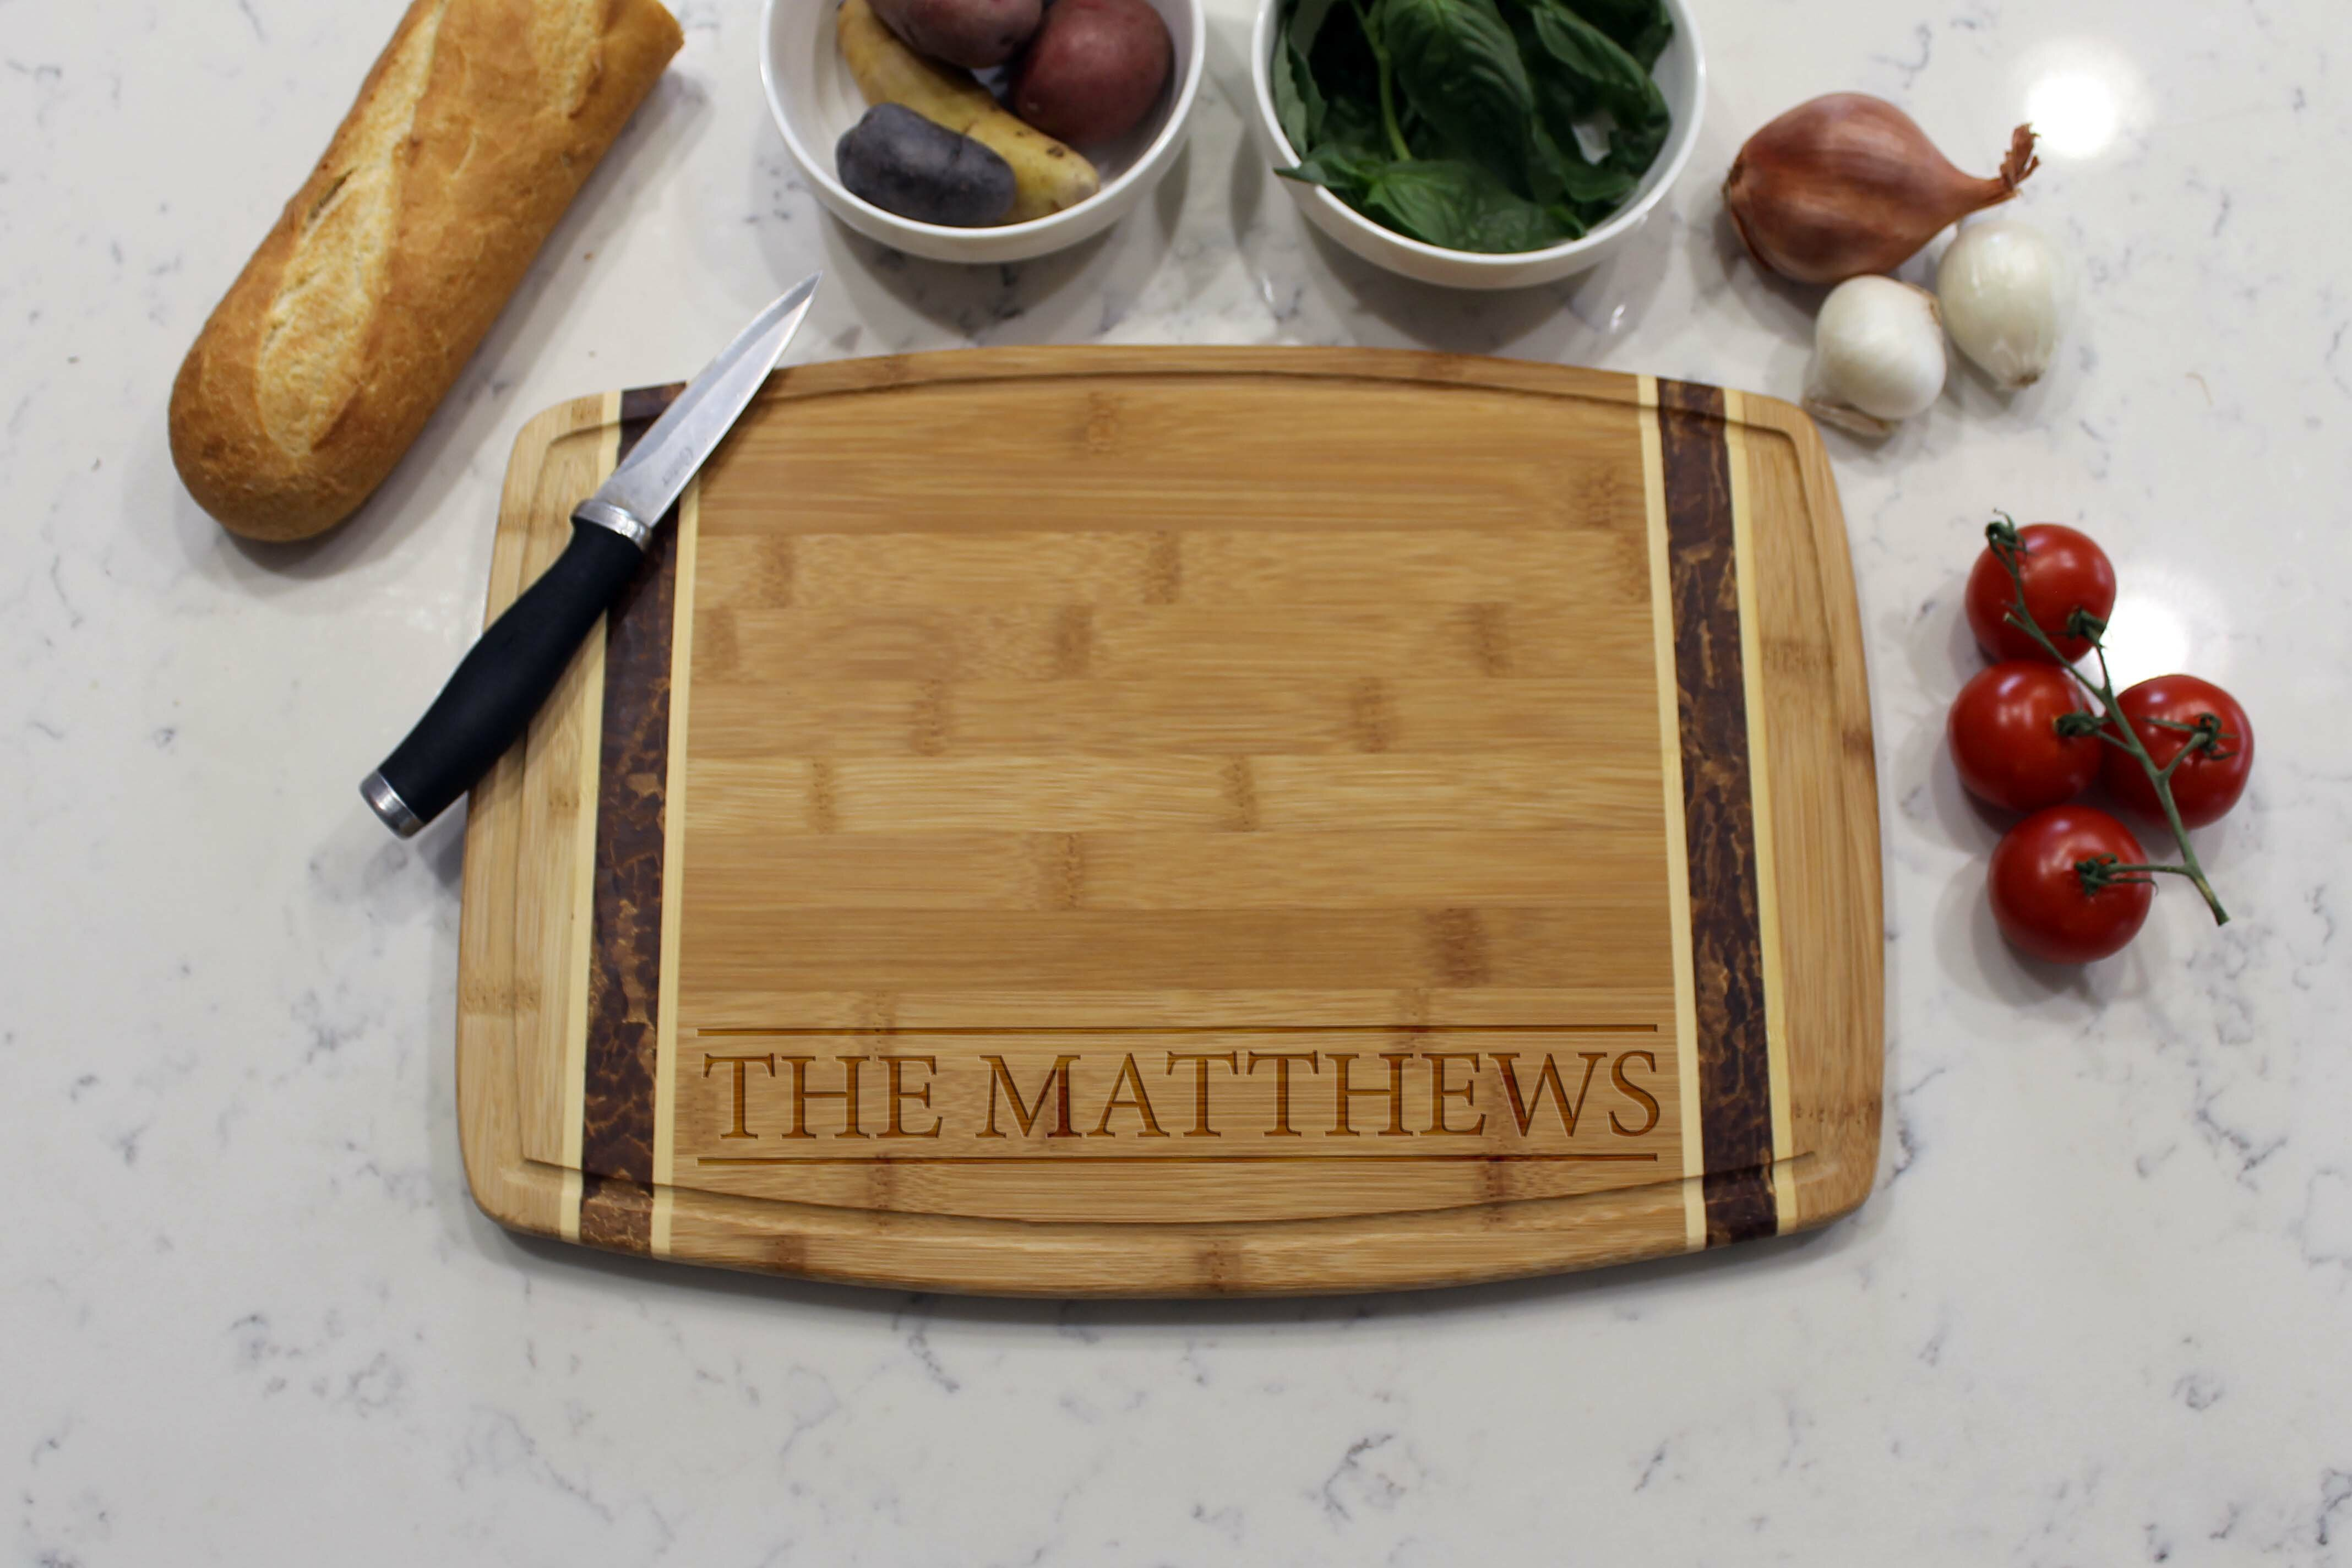 Etchey Marble Bamboo Cutting Board Wayfair